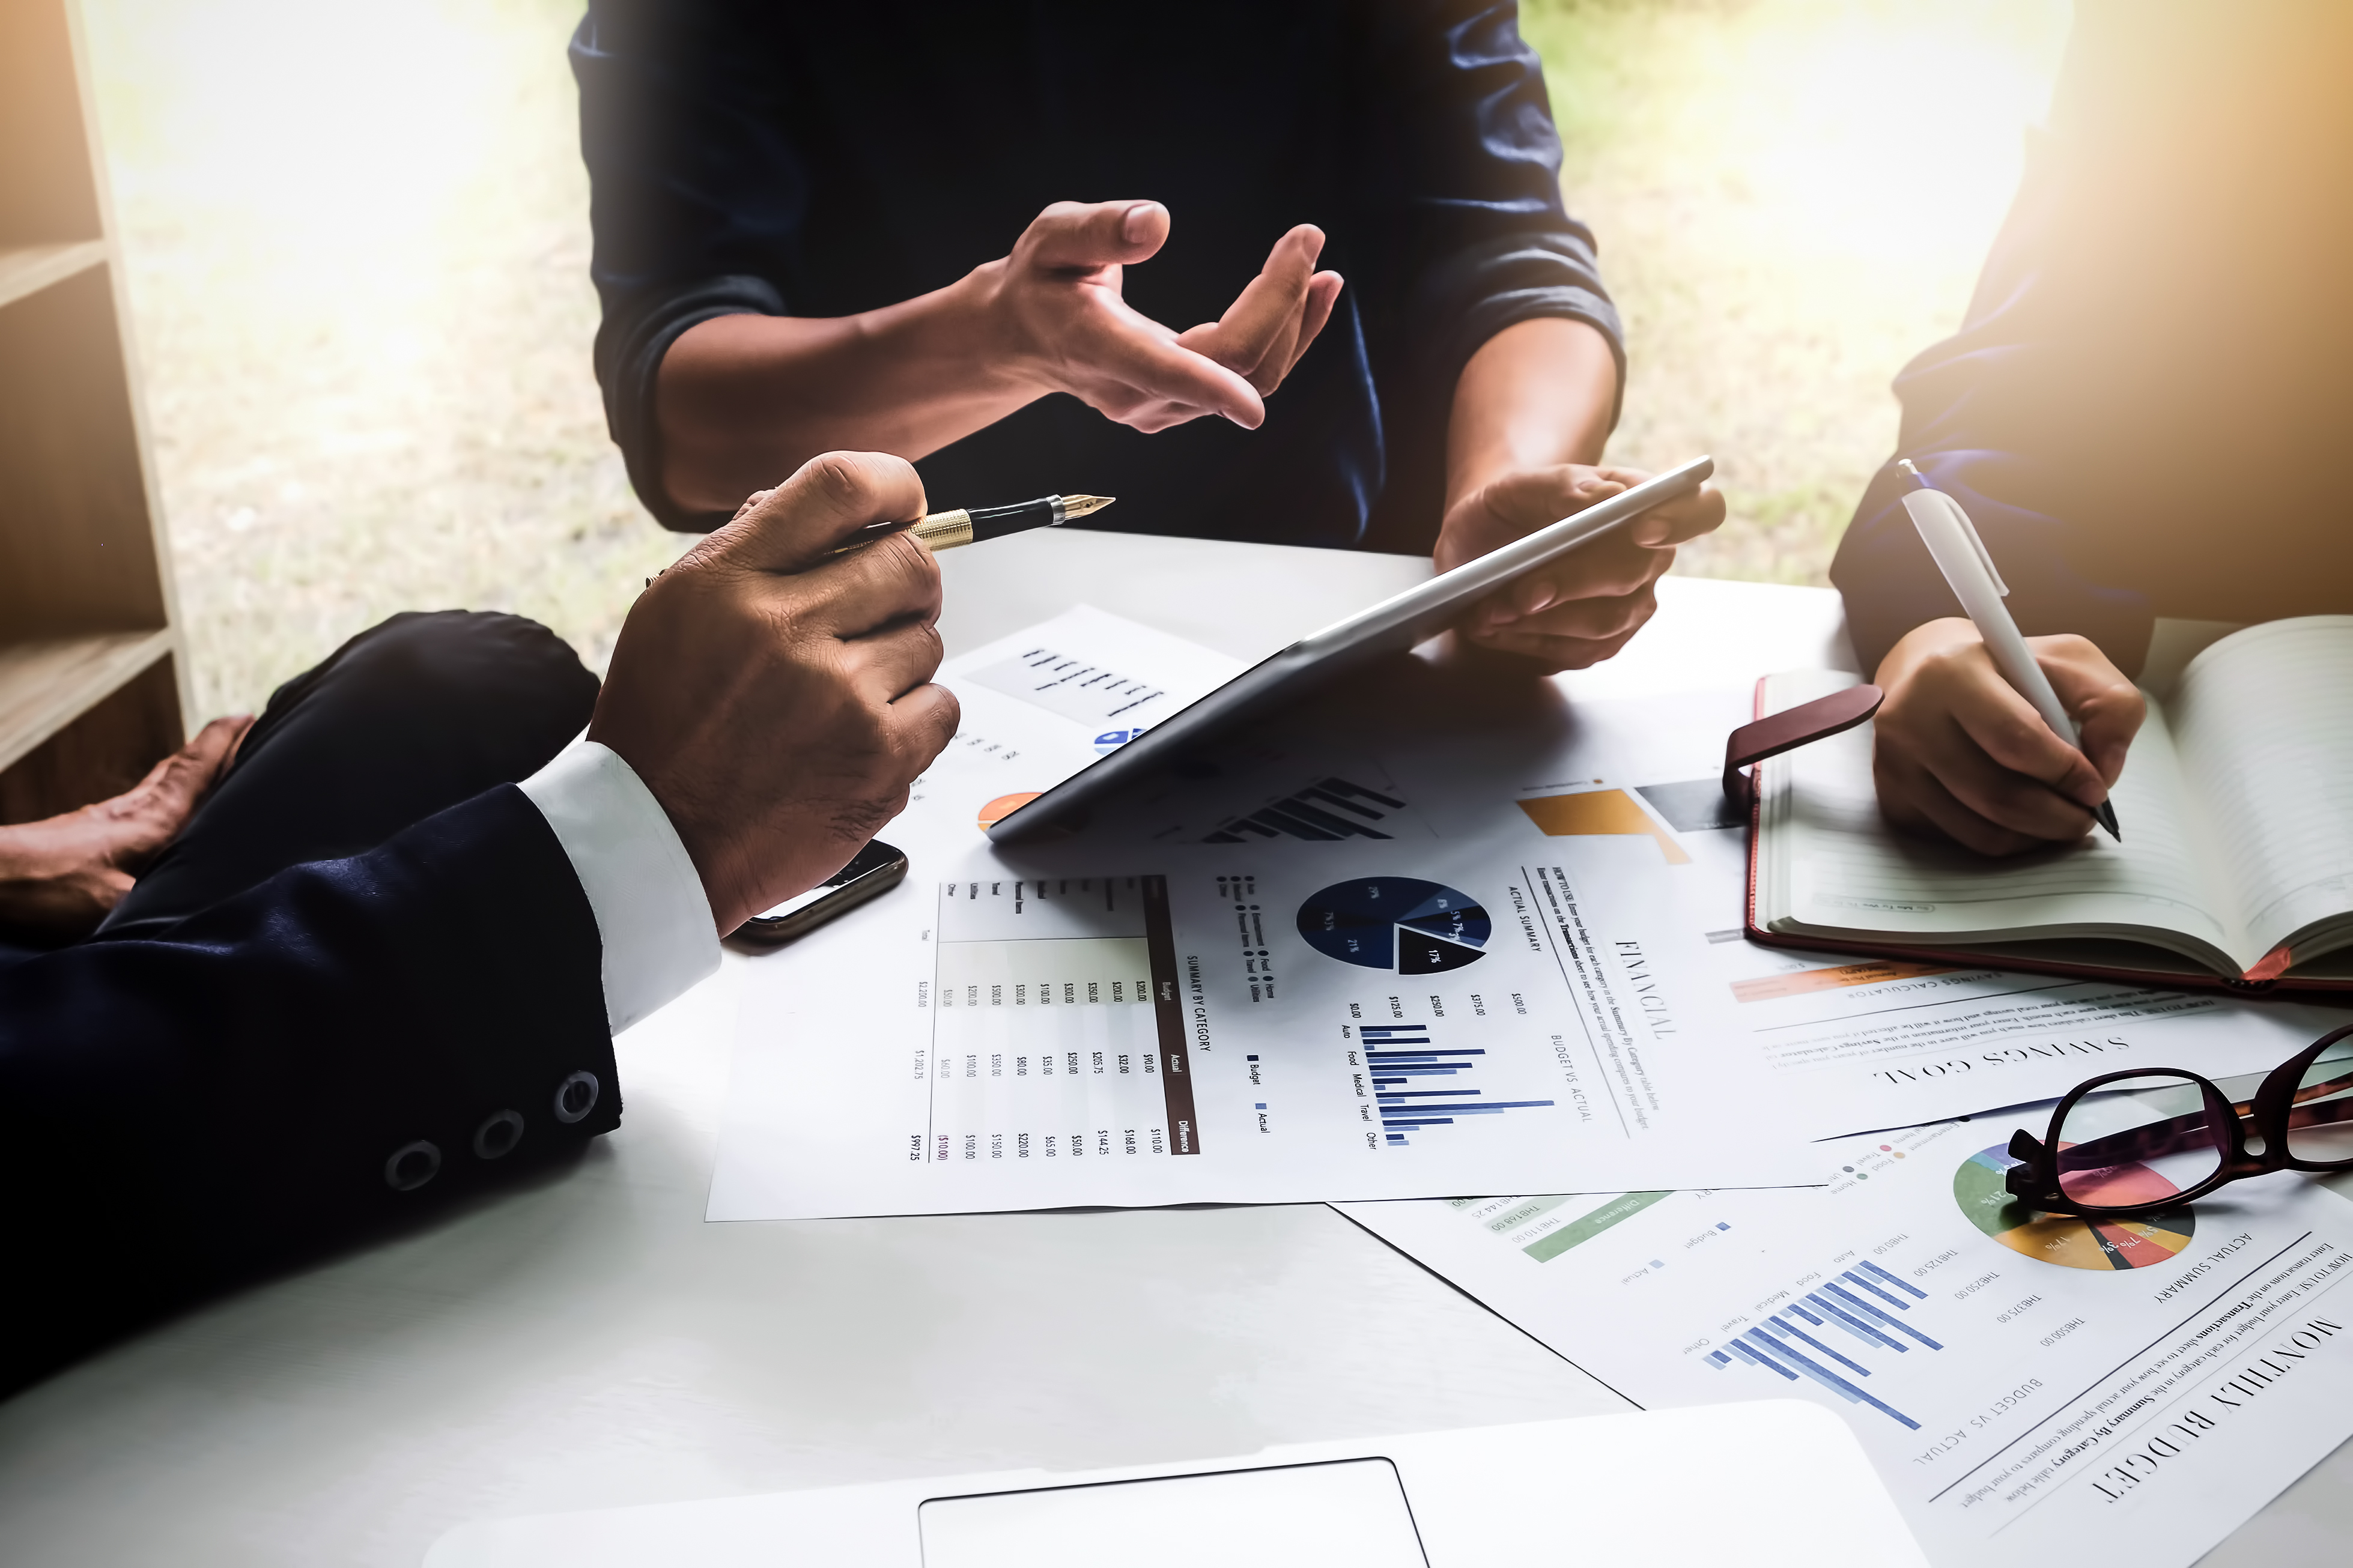 Best Presentation Tools to Streamline Enterprise Level Sales Materials - Ingage blog 2